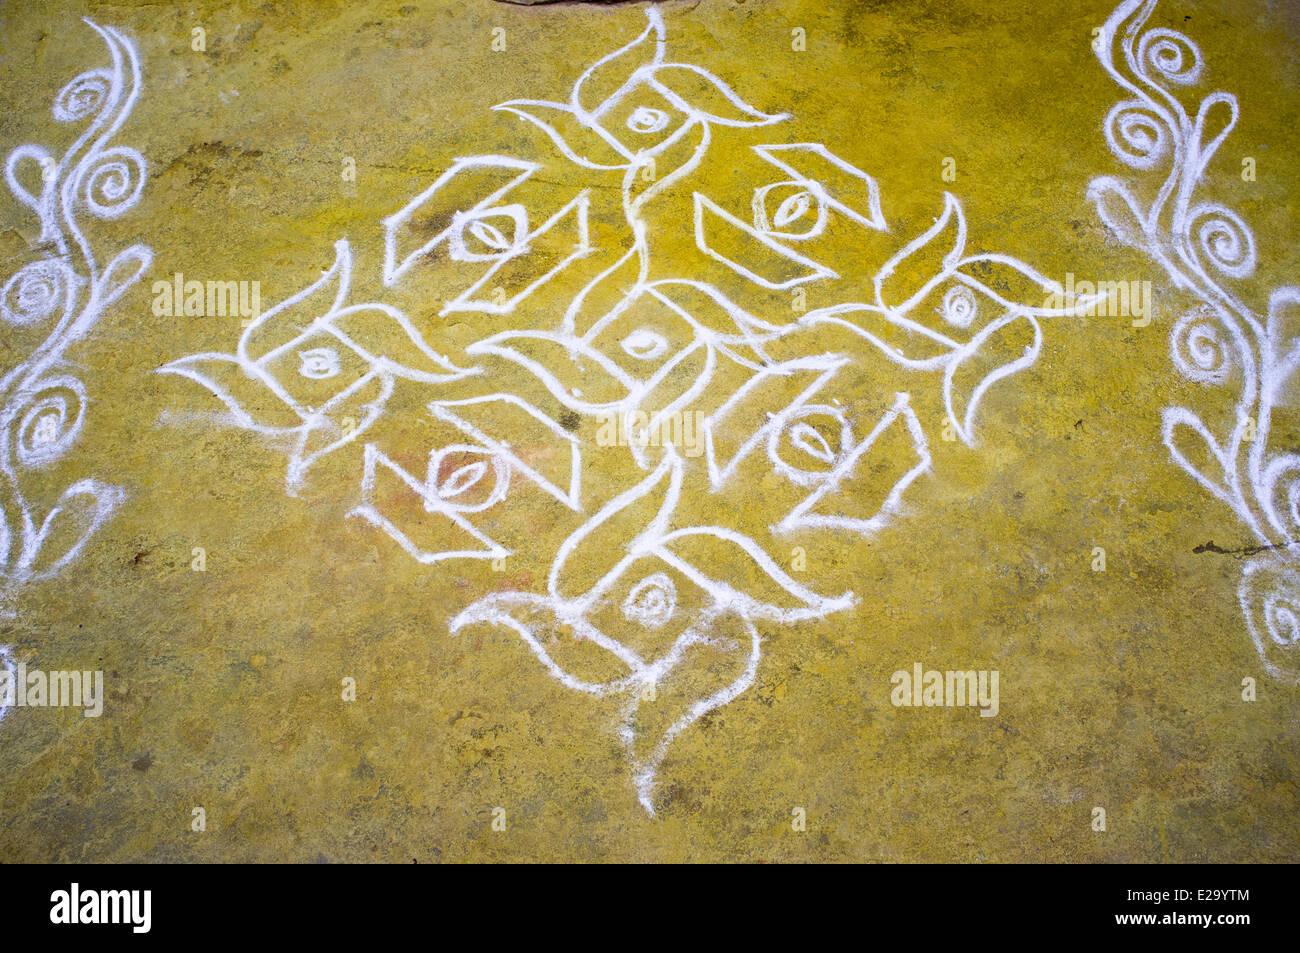 India, Tamil Nadu State, Mahabalipuram, a rangoli drawn on a doorstep with rice powder to ward off evil spirits Stock Photo